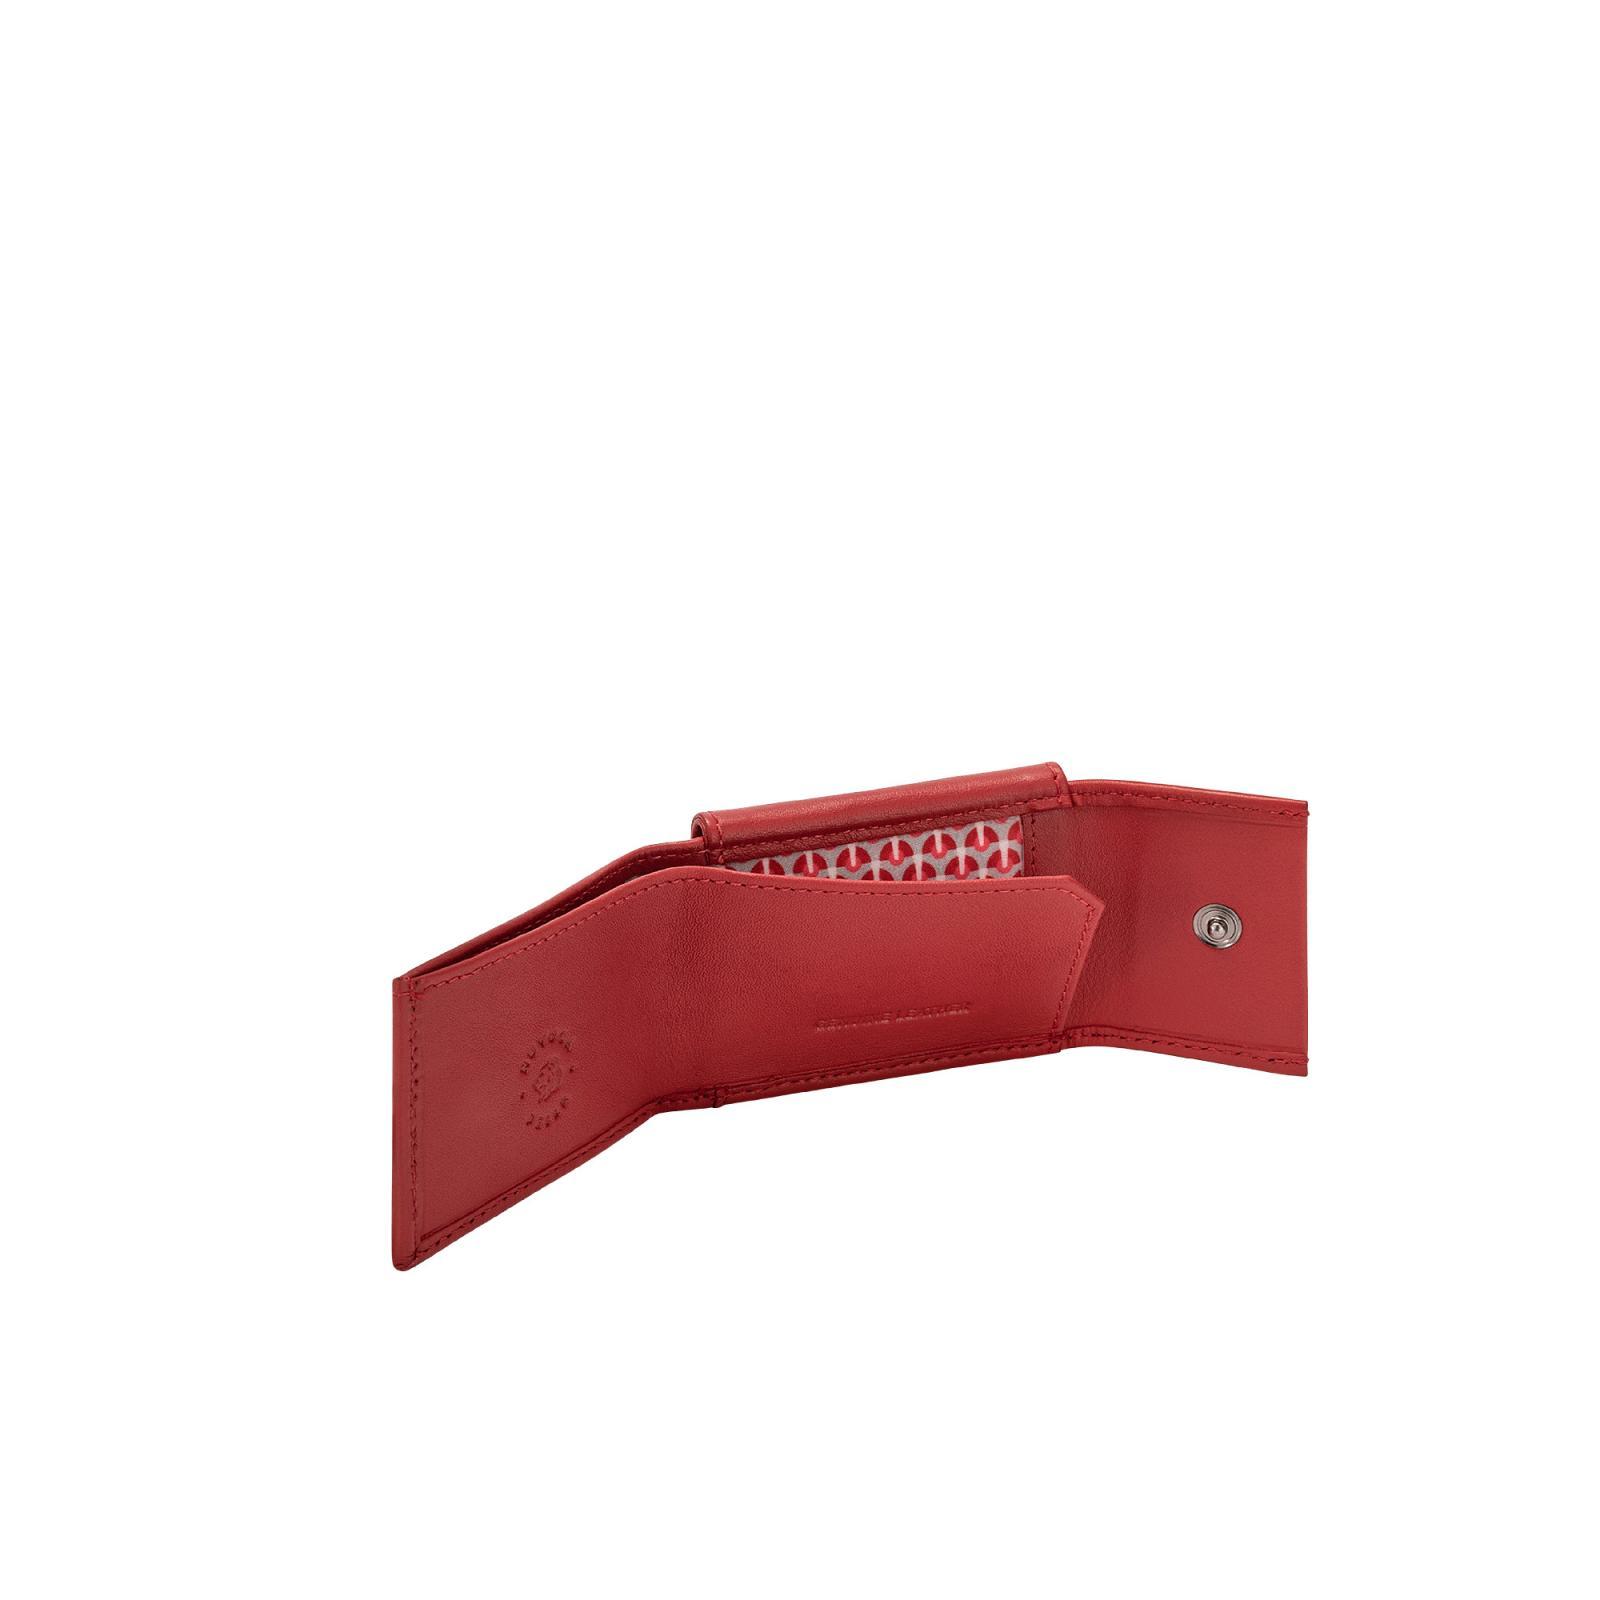 Portafogli  Uomo  Nappa - Buddy  - Rosso